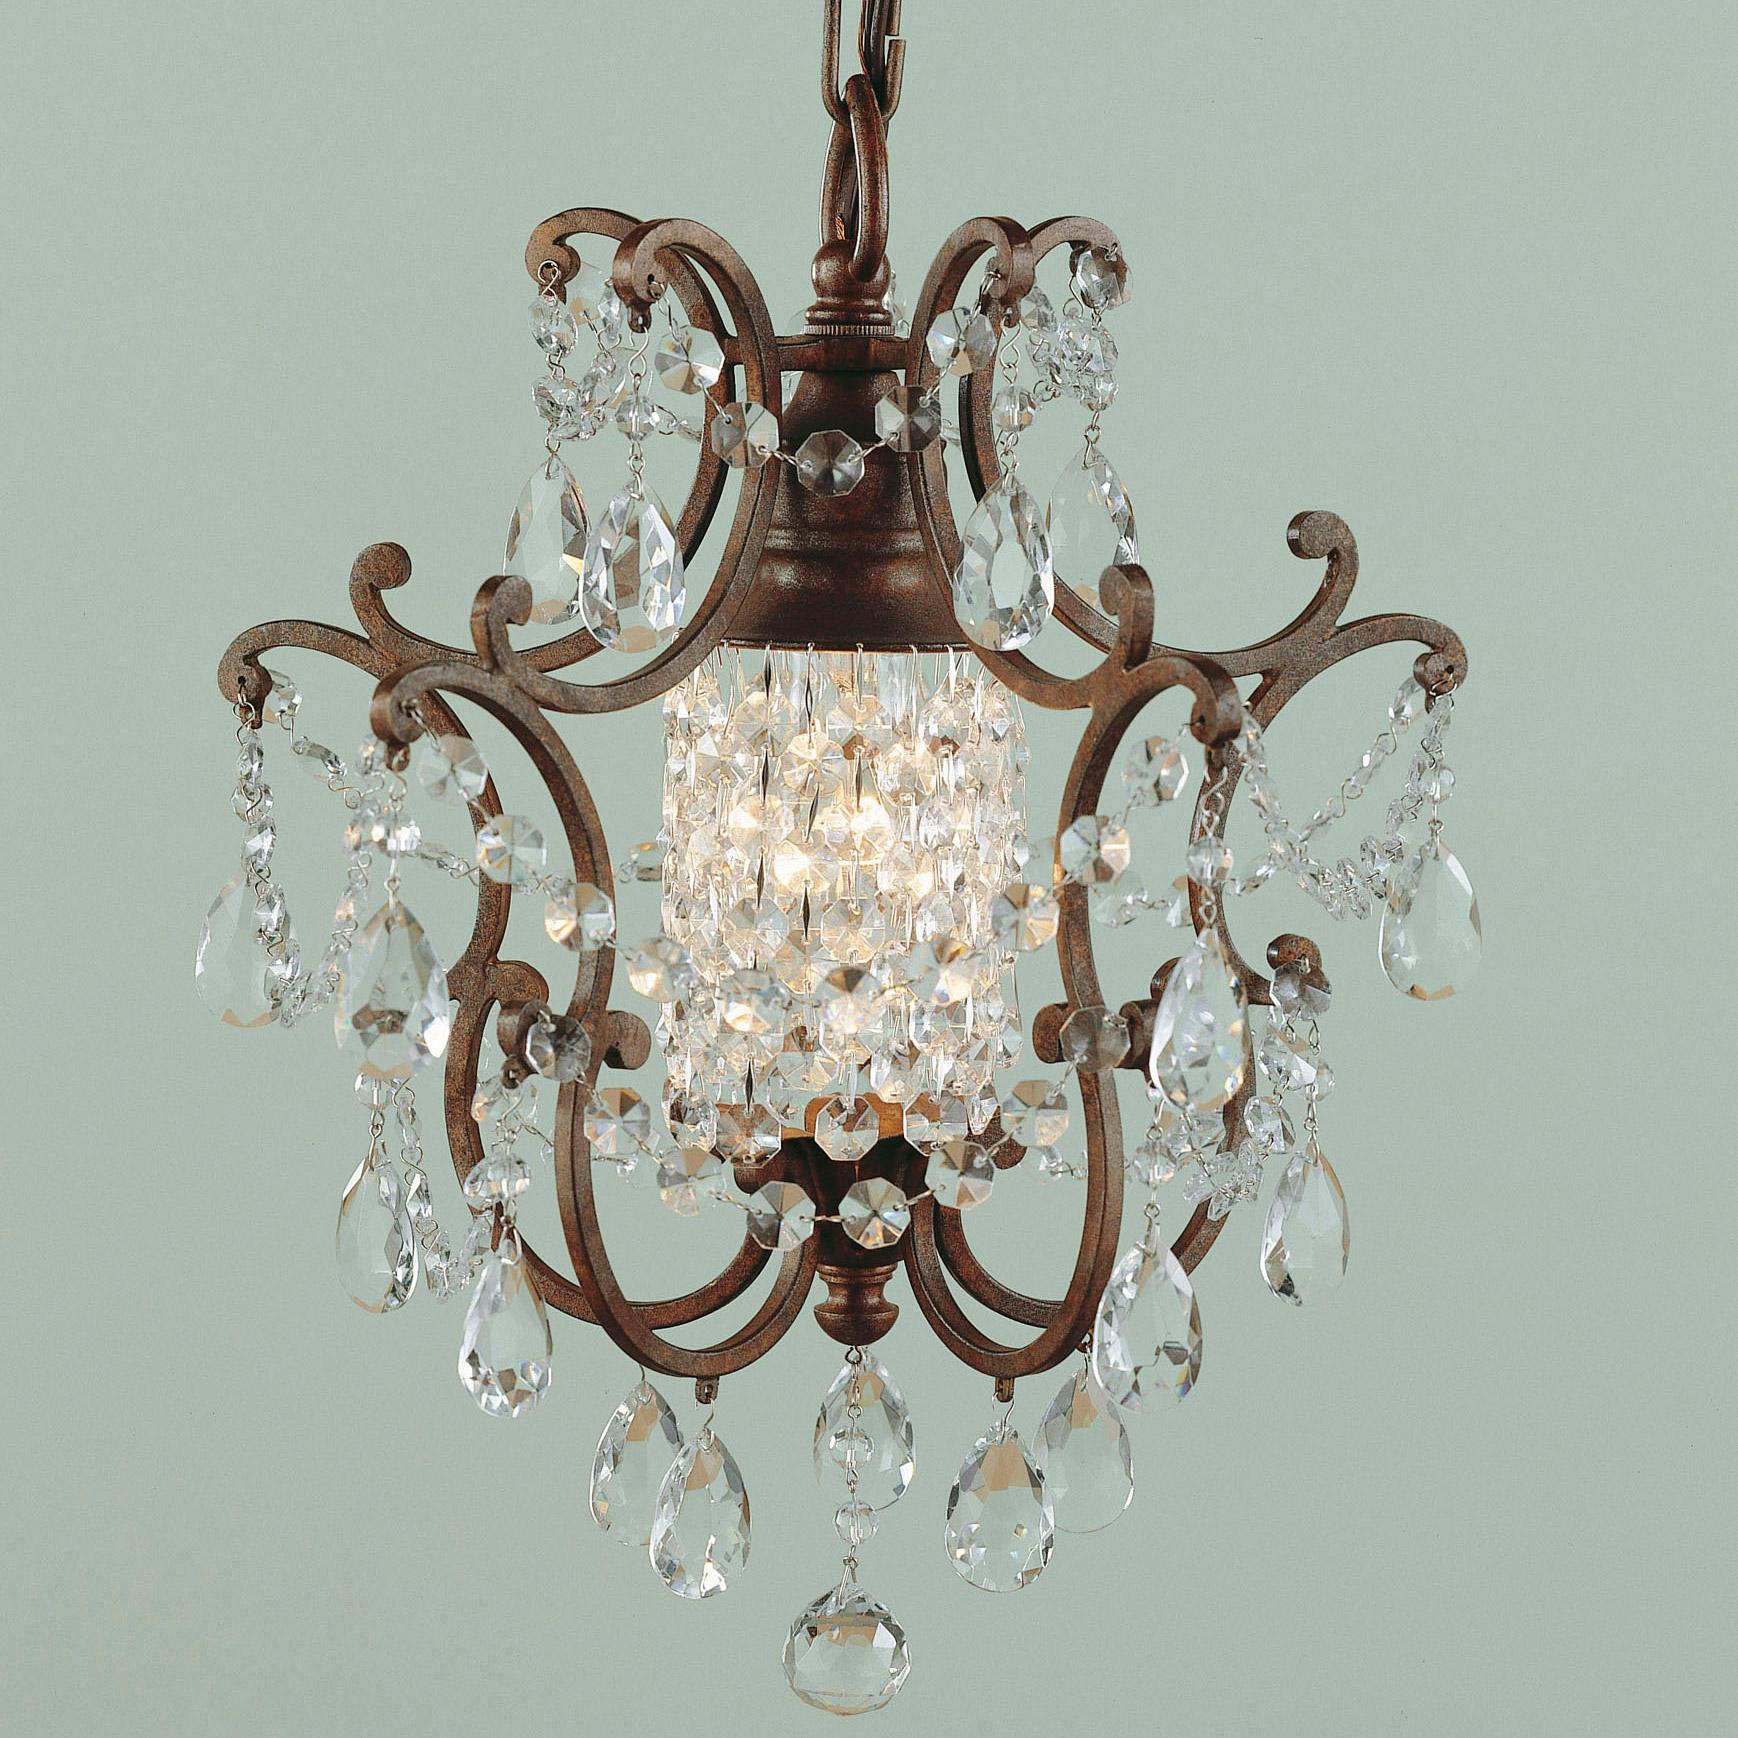 murray feiss f18791brb crystal maison de ville mini duo mini chandelier